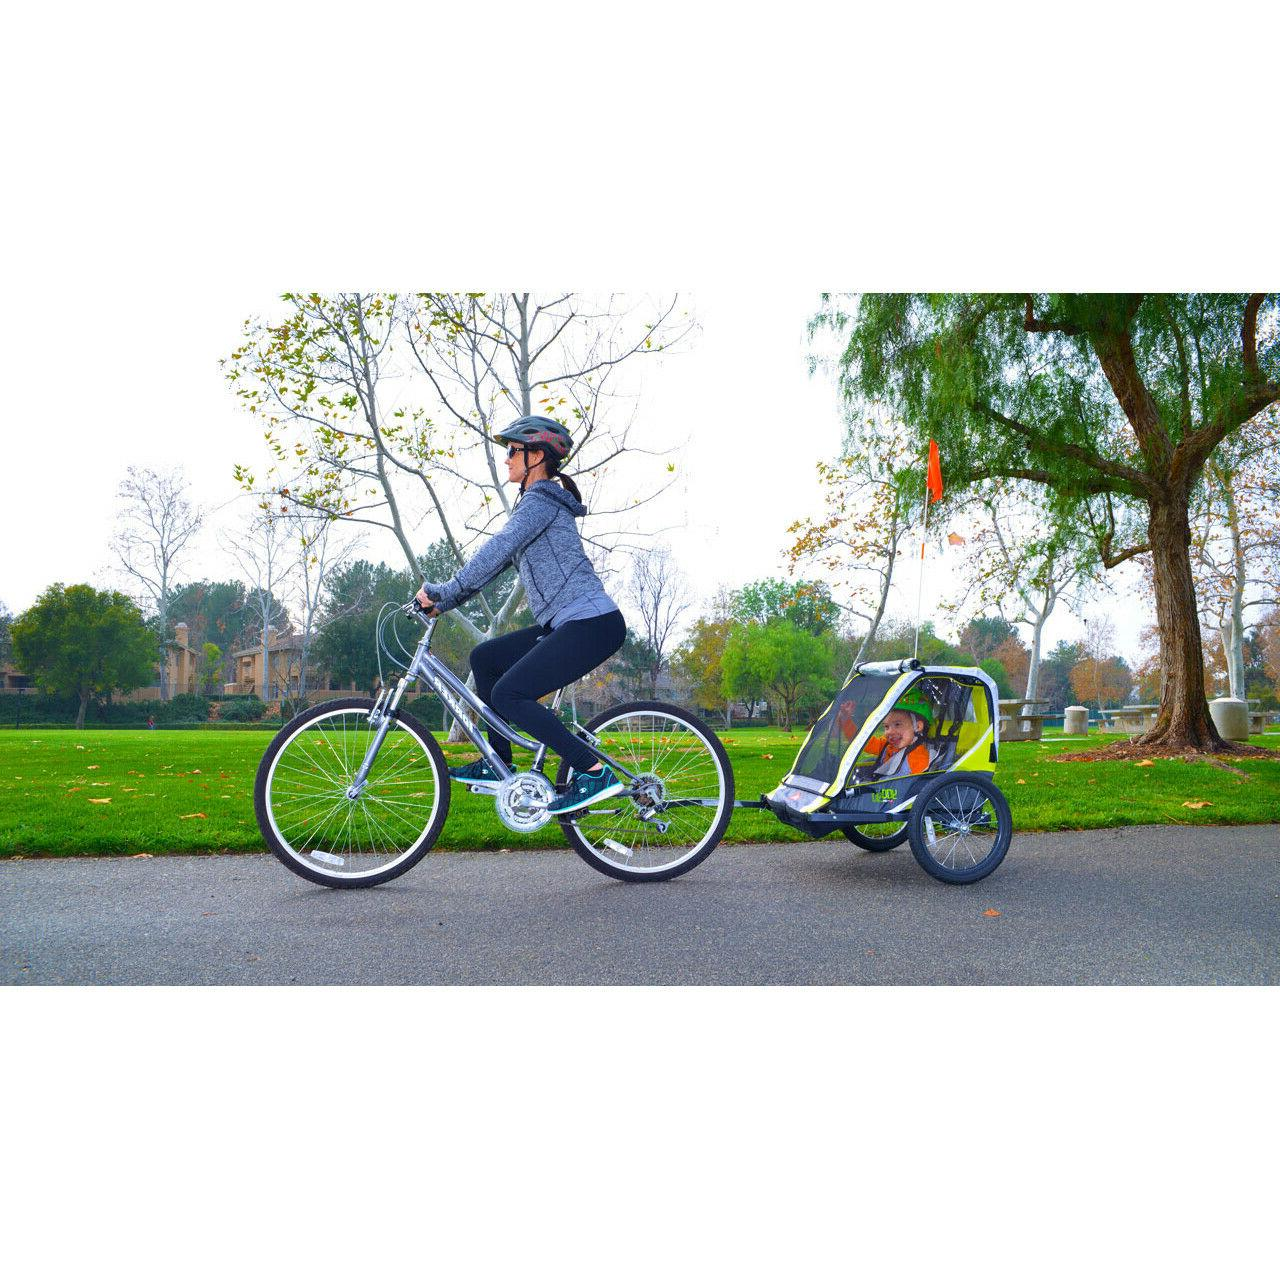 Green 2-Child Bike Lightweight Outdoor Kid Stroller Racing Sports